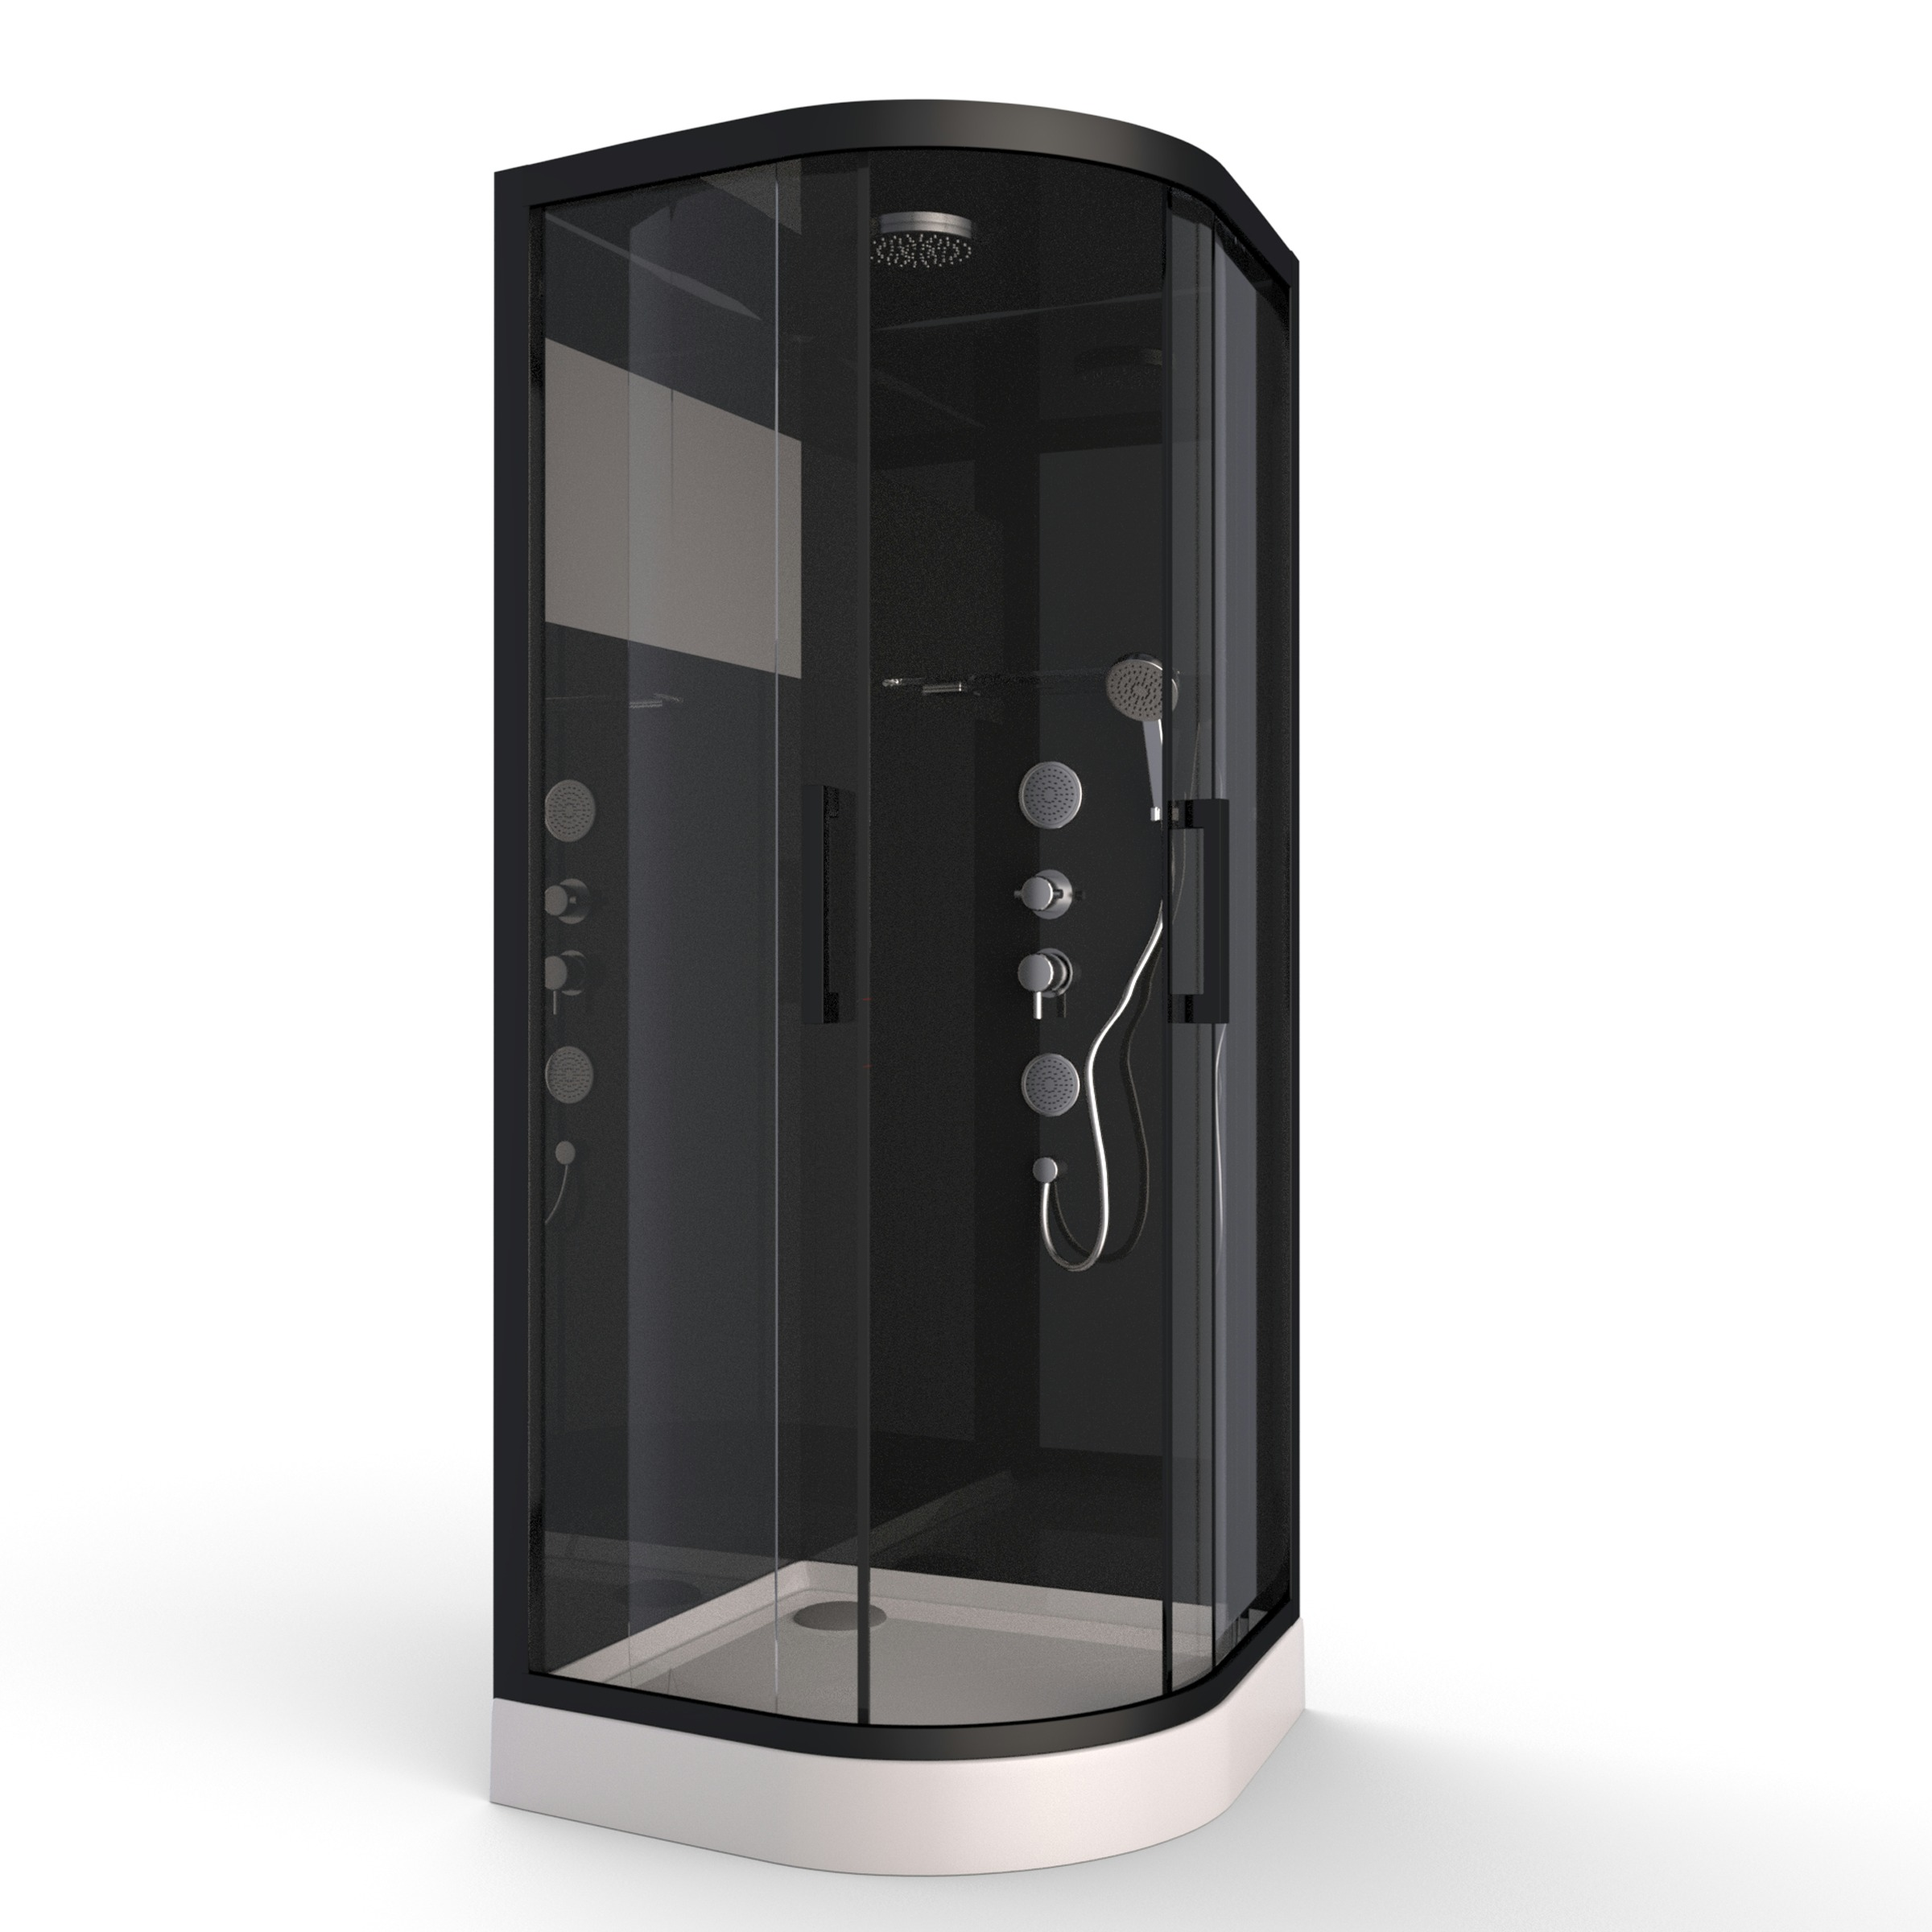 Aurlane Douchecabine met Schuifdeur Black Mirror 2 Kwartrond Zwart 90x90 cm